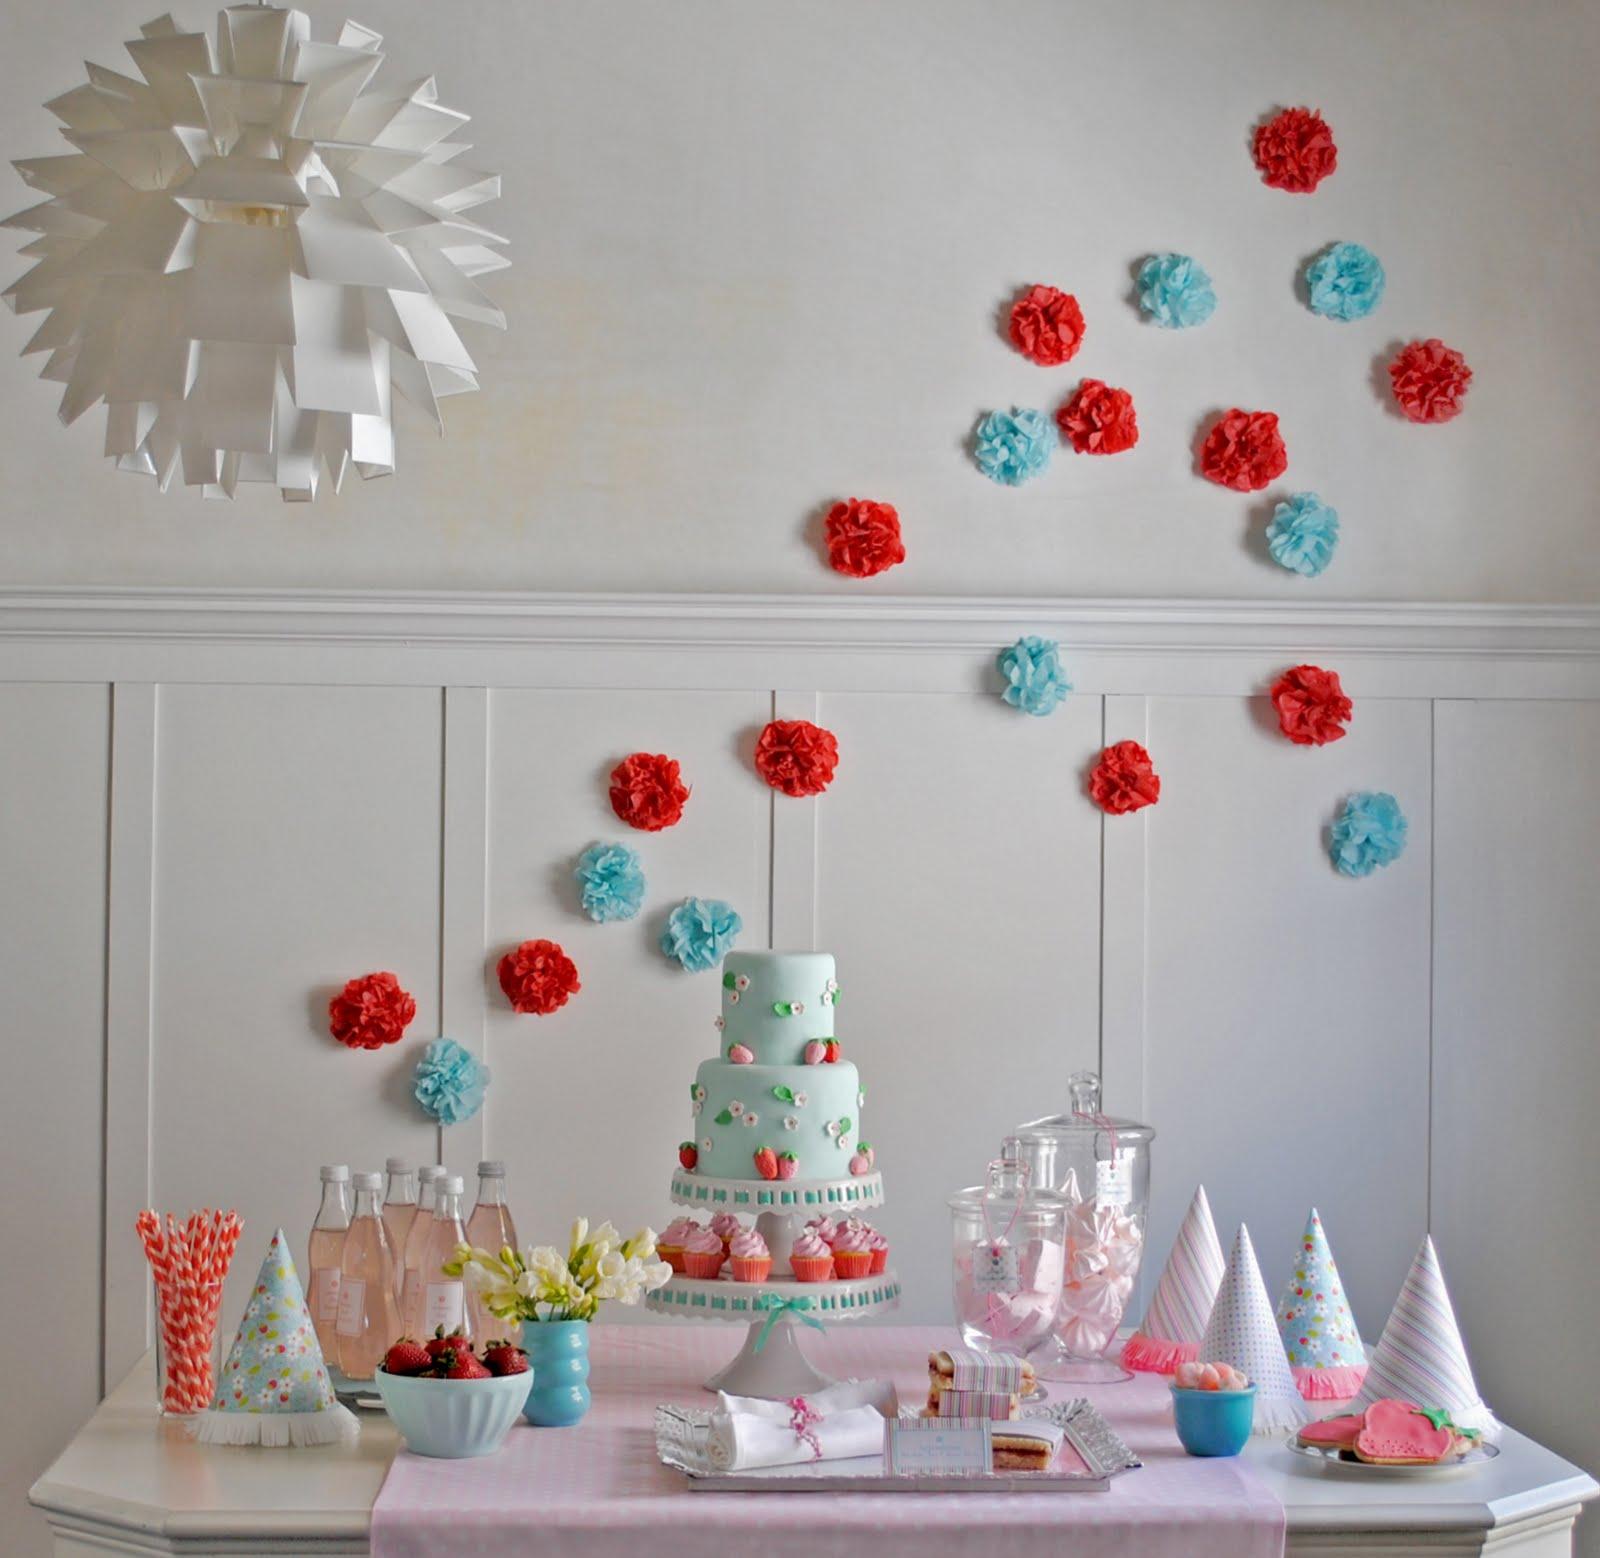 Kara's Party Ideas Strawberry Soiree Birthday Party